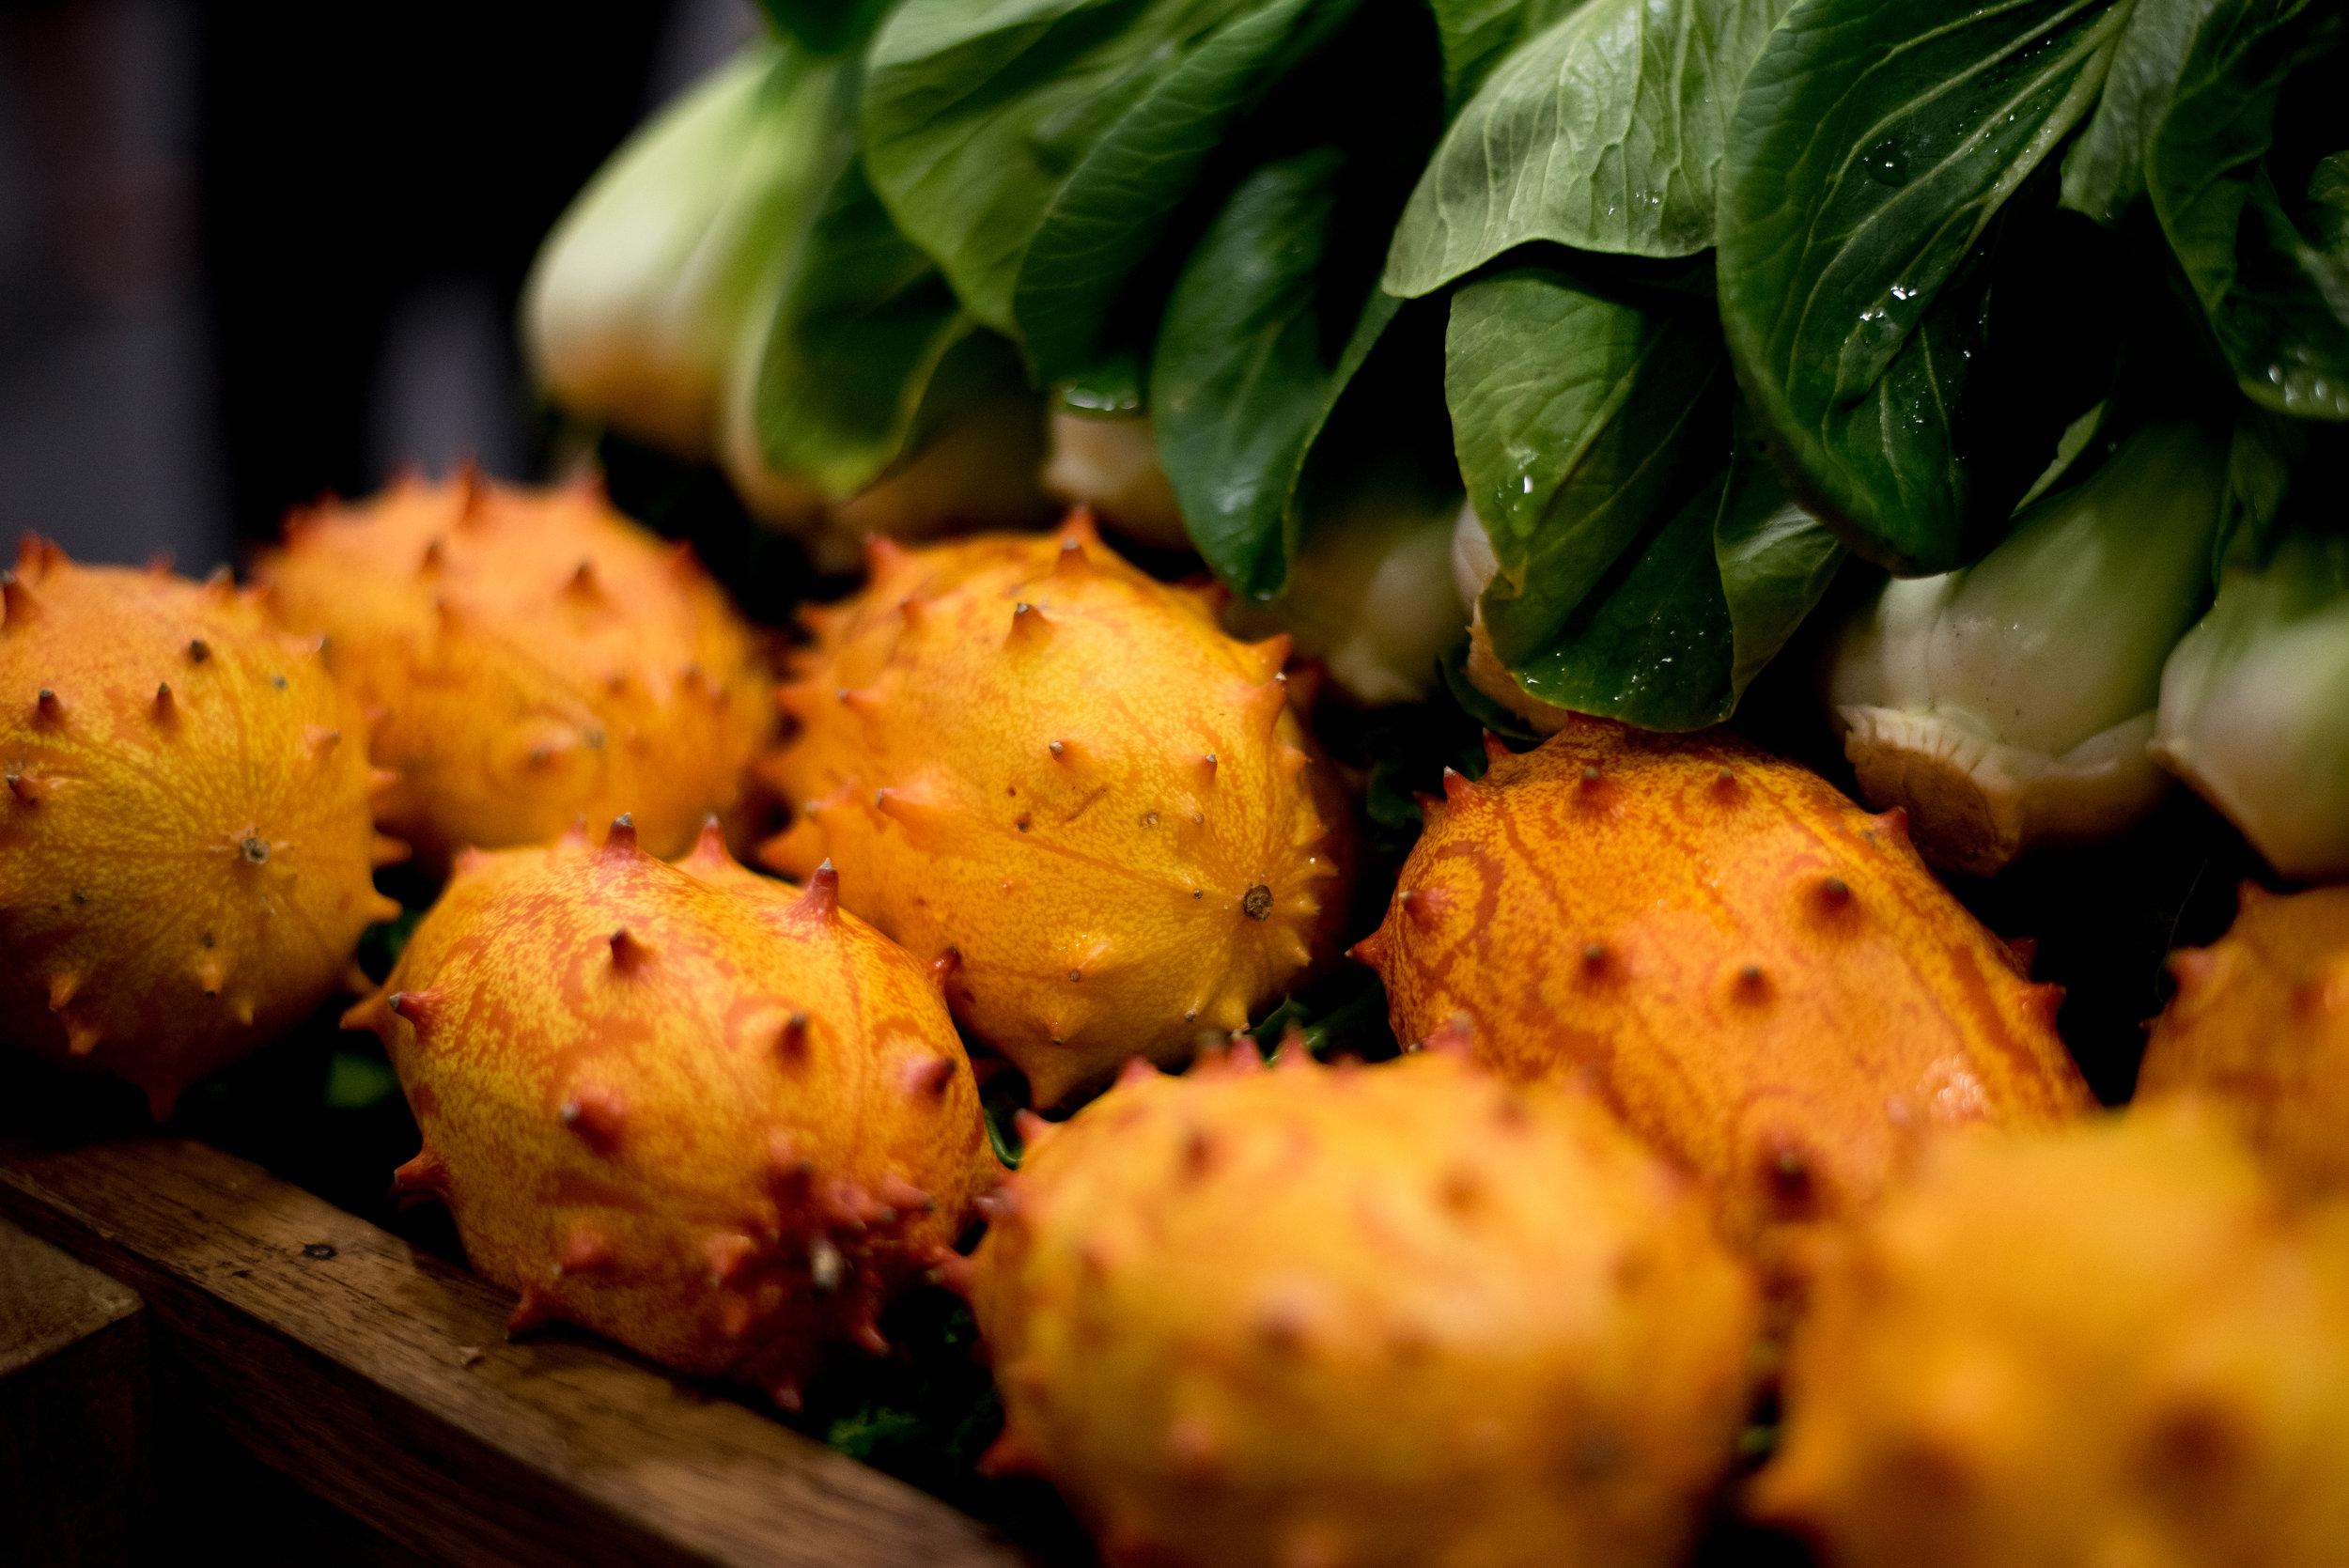 FoodFanaticsLive-Event-Food-Photography090.jpg